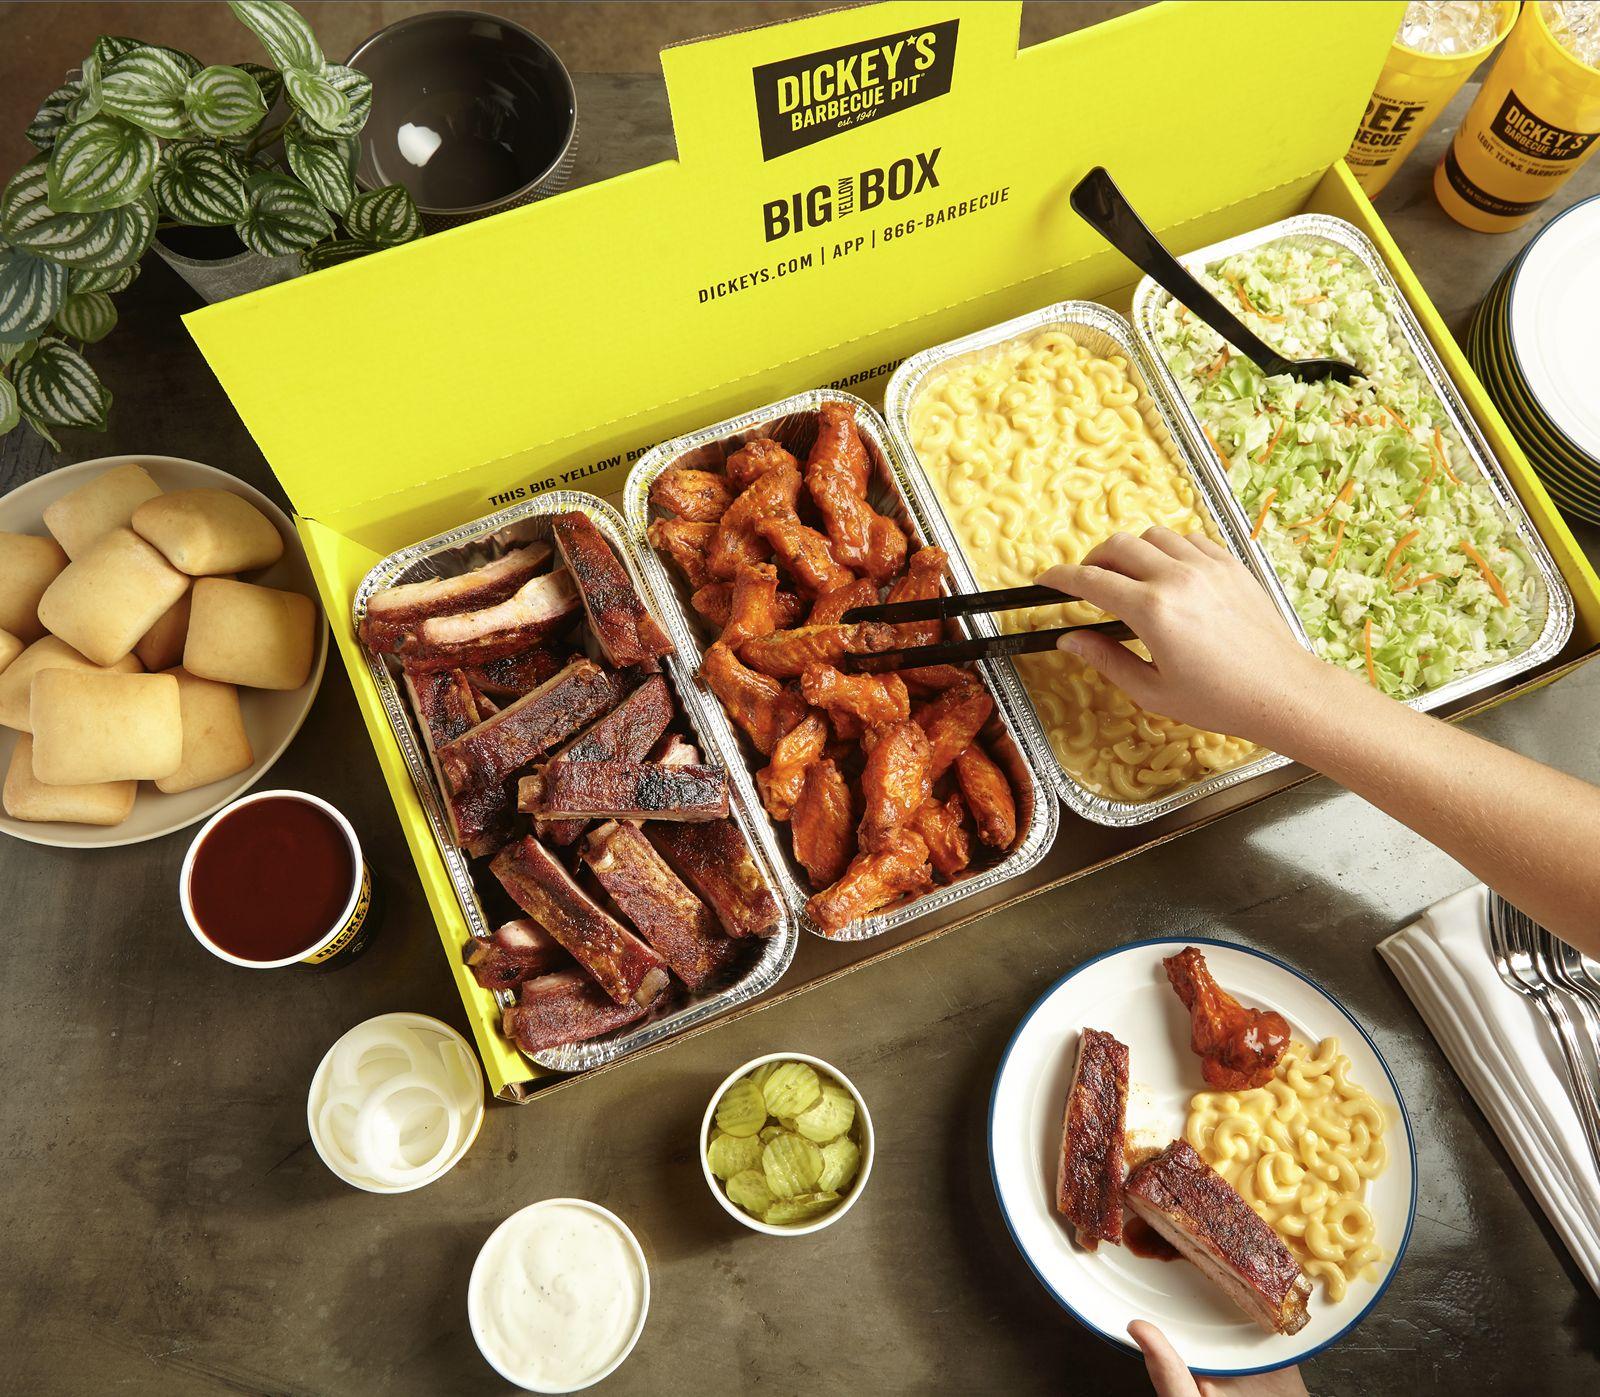 Celebrate Labor Day with Dickey's Legit. Texas. Barbecue.